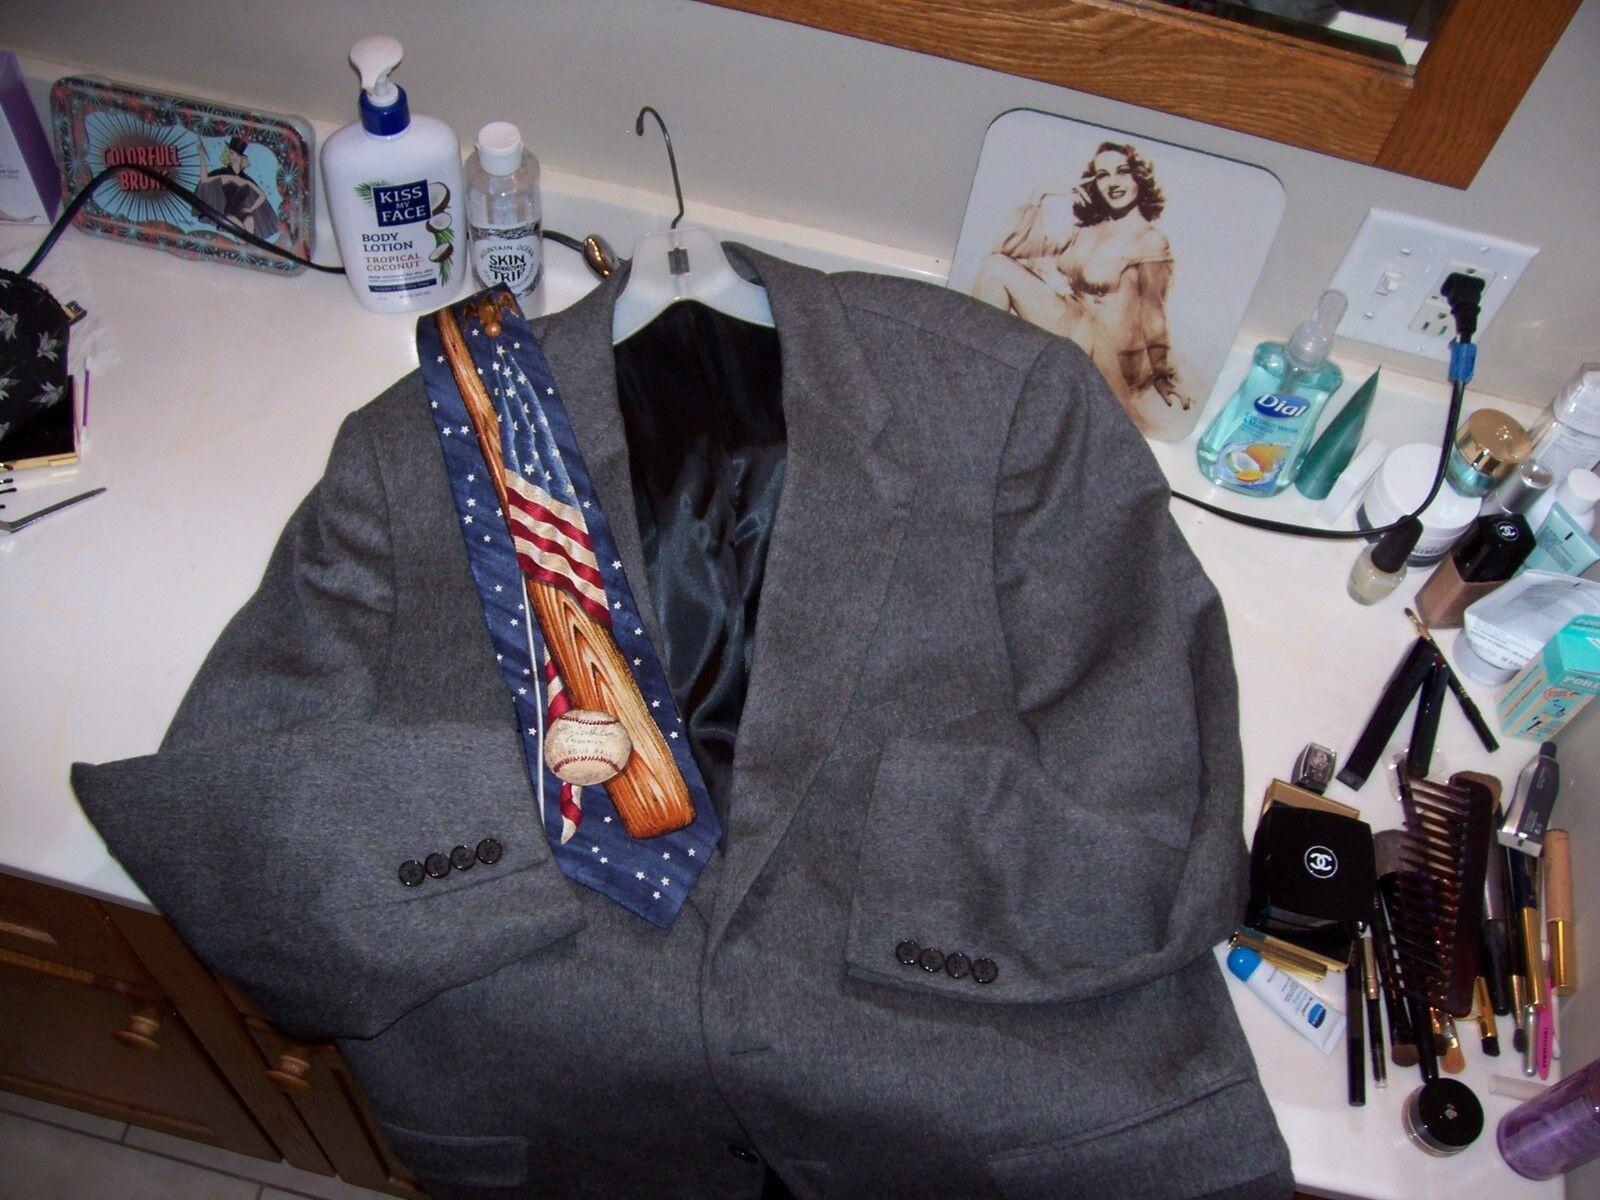 Men's  44L camel hair sport coat Frank Stella Clothiers NYC & baseball tie